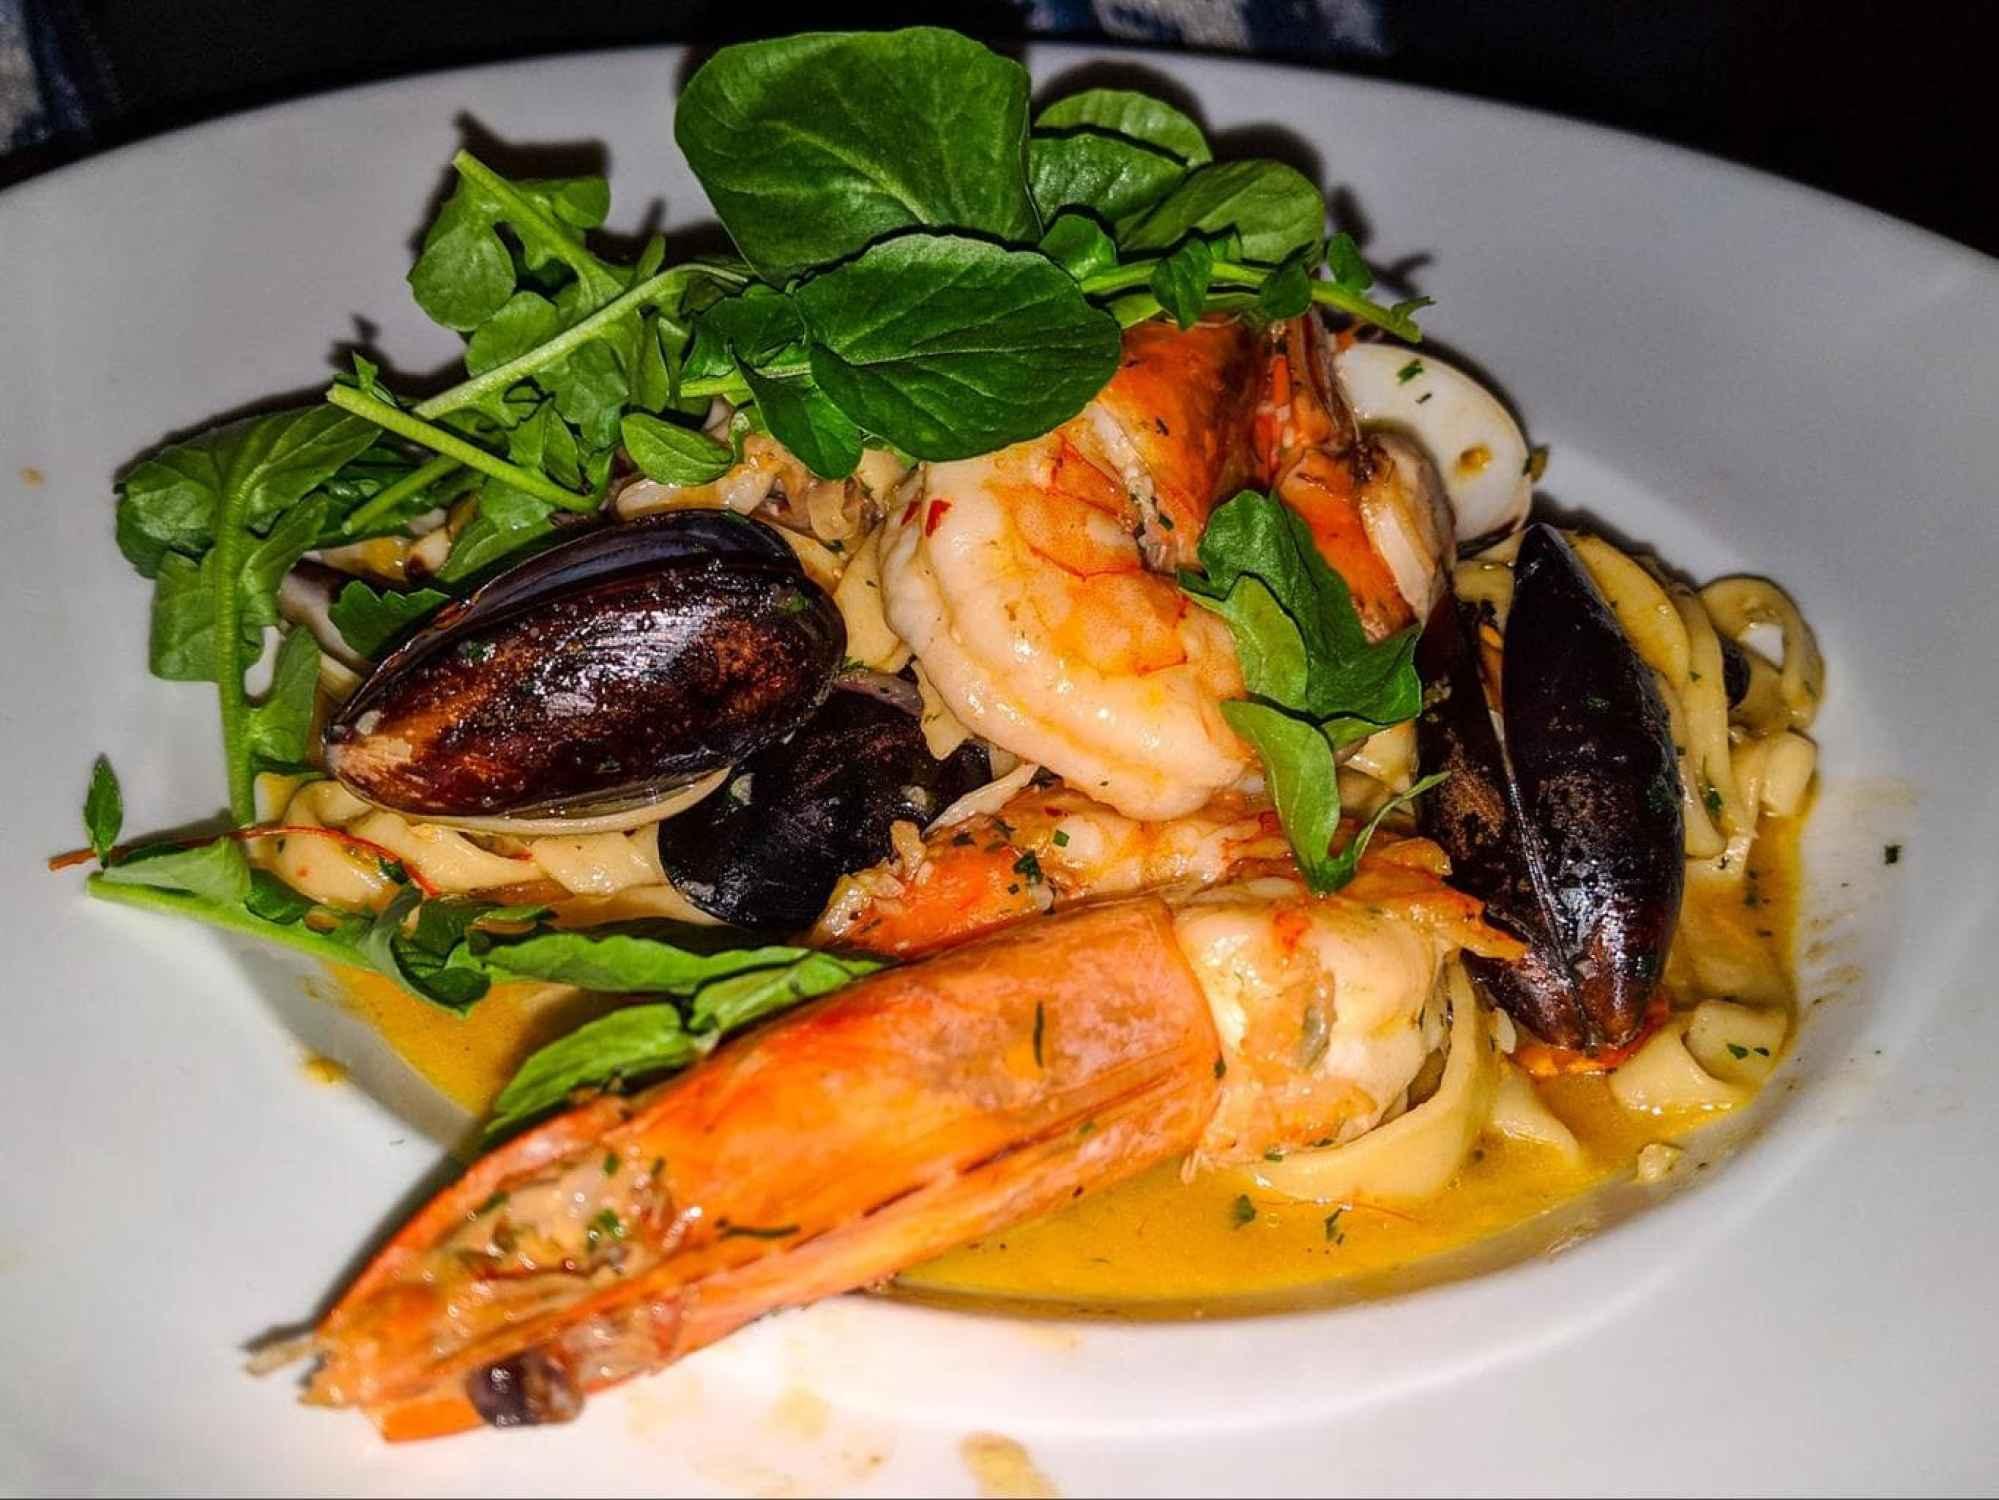 Tapado, creole fish and seafood stew